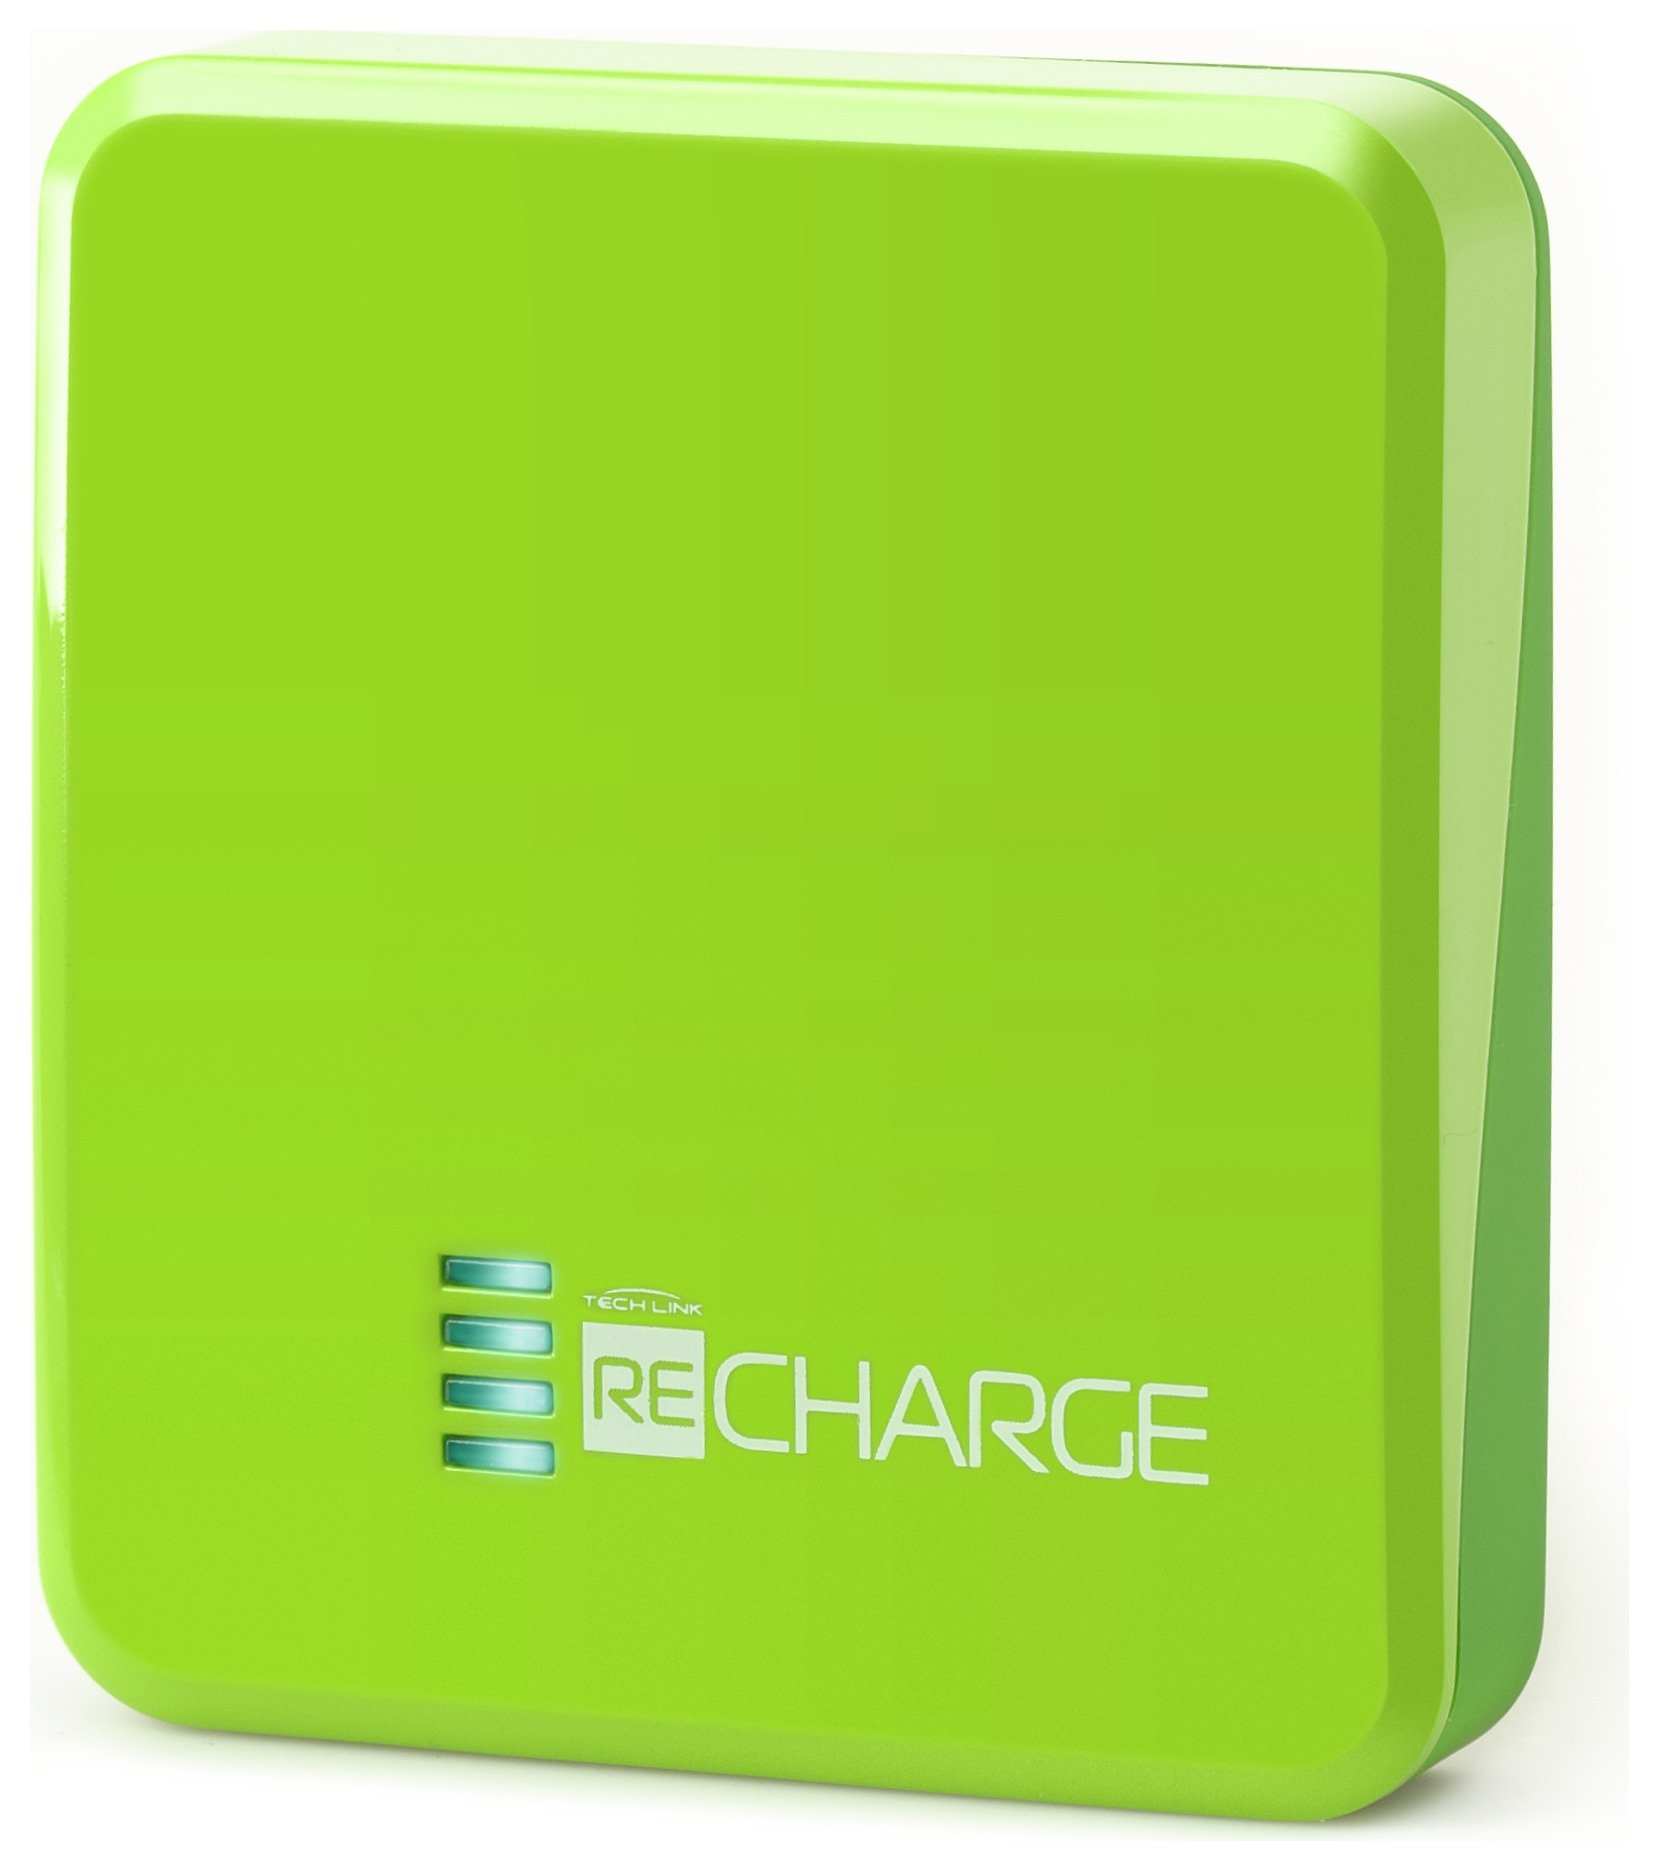 Techlink Techlink 2500mAh Rechargeable USB Power Bank.